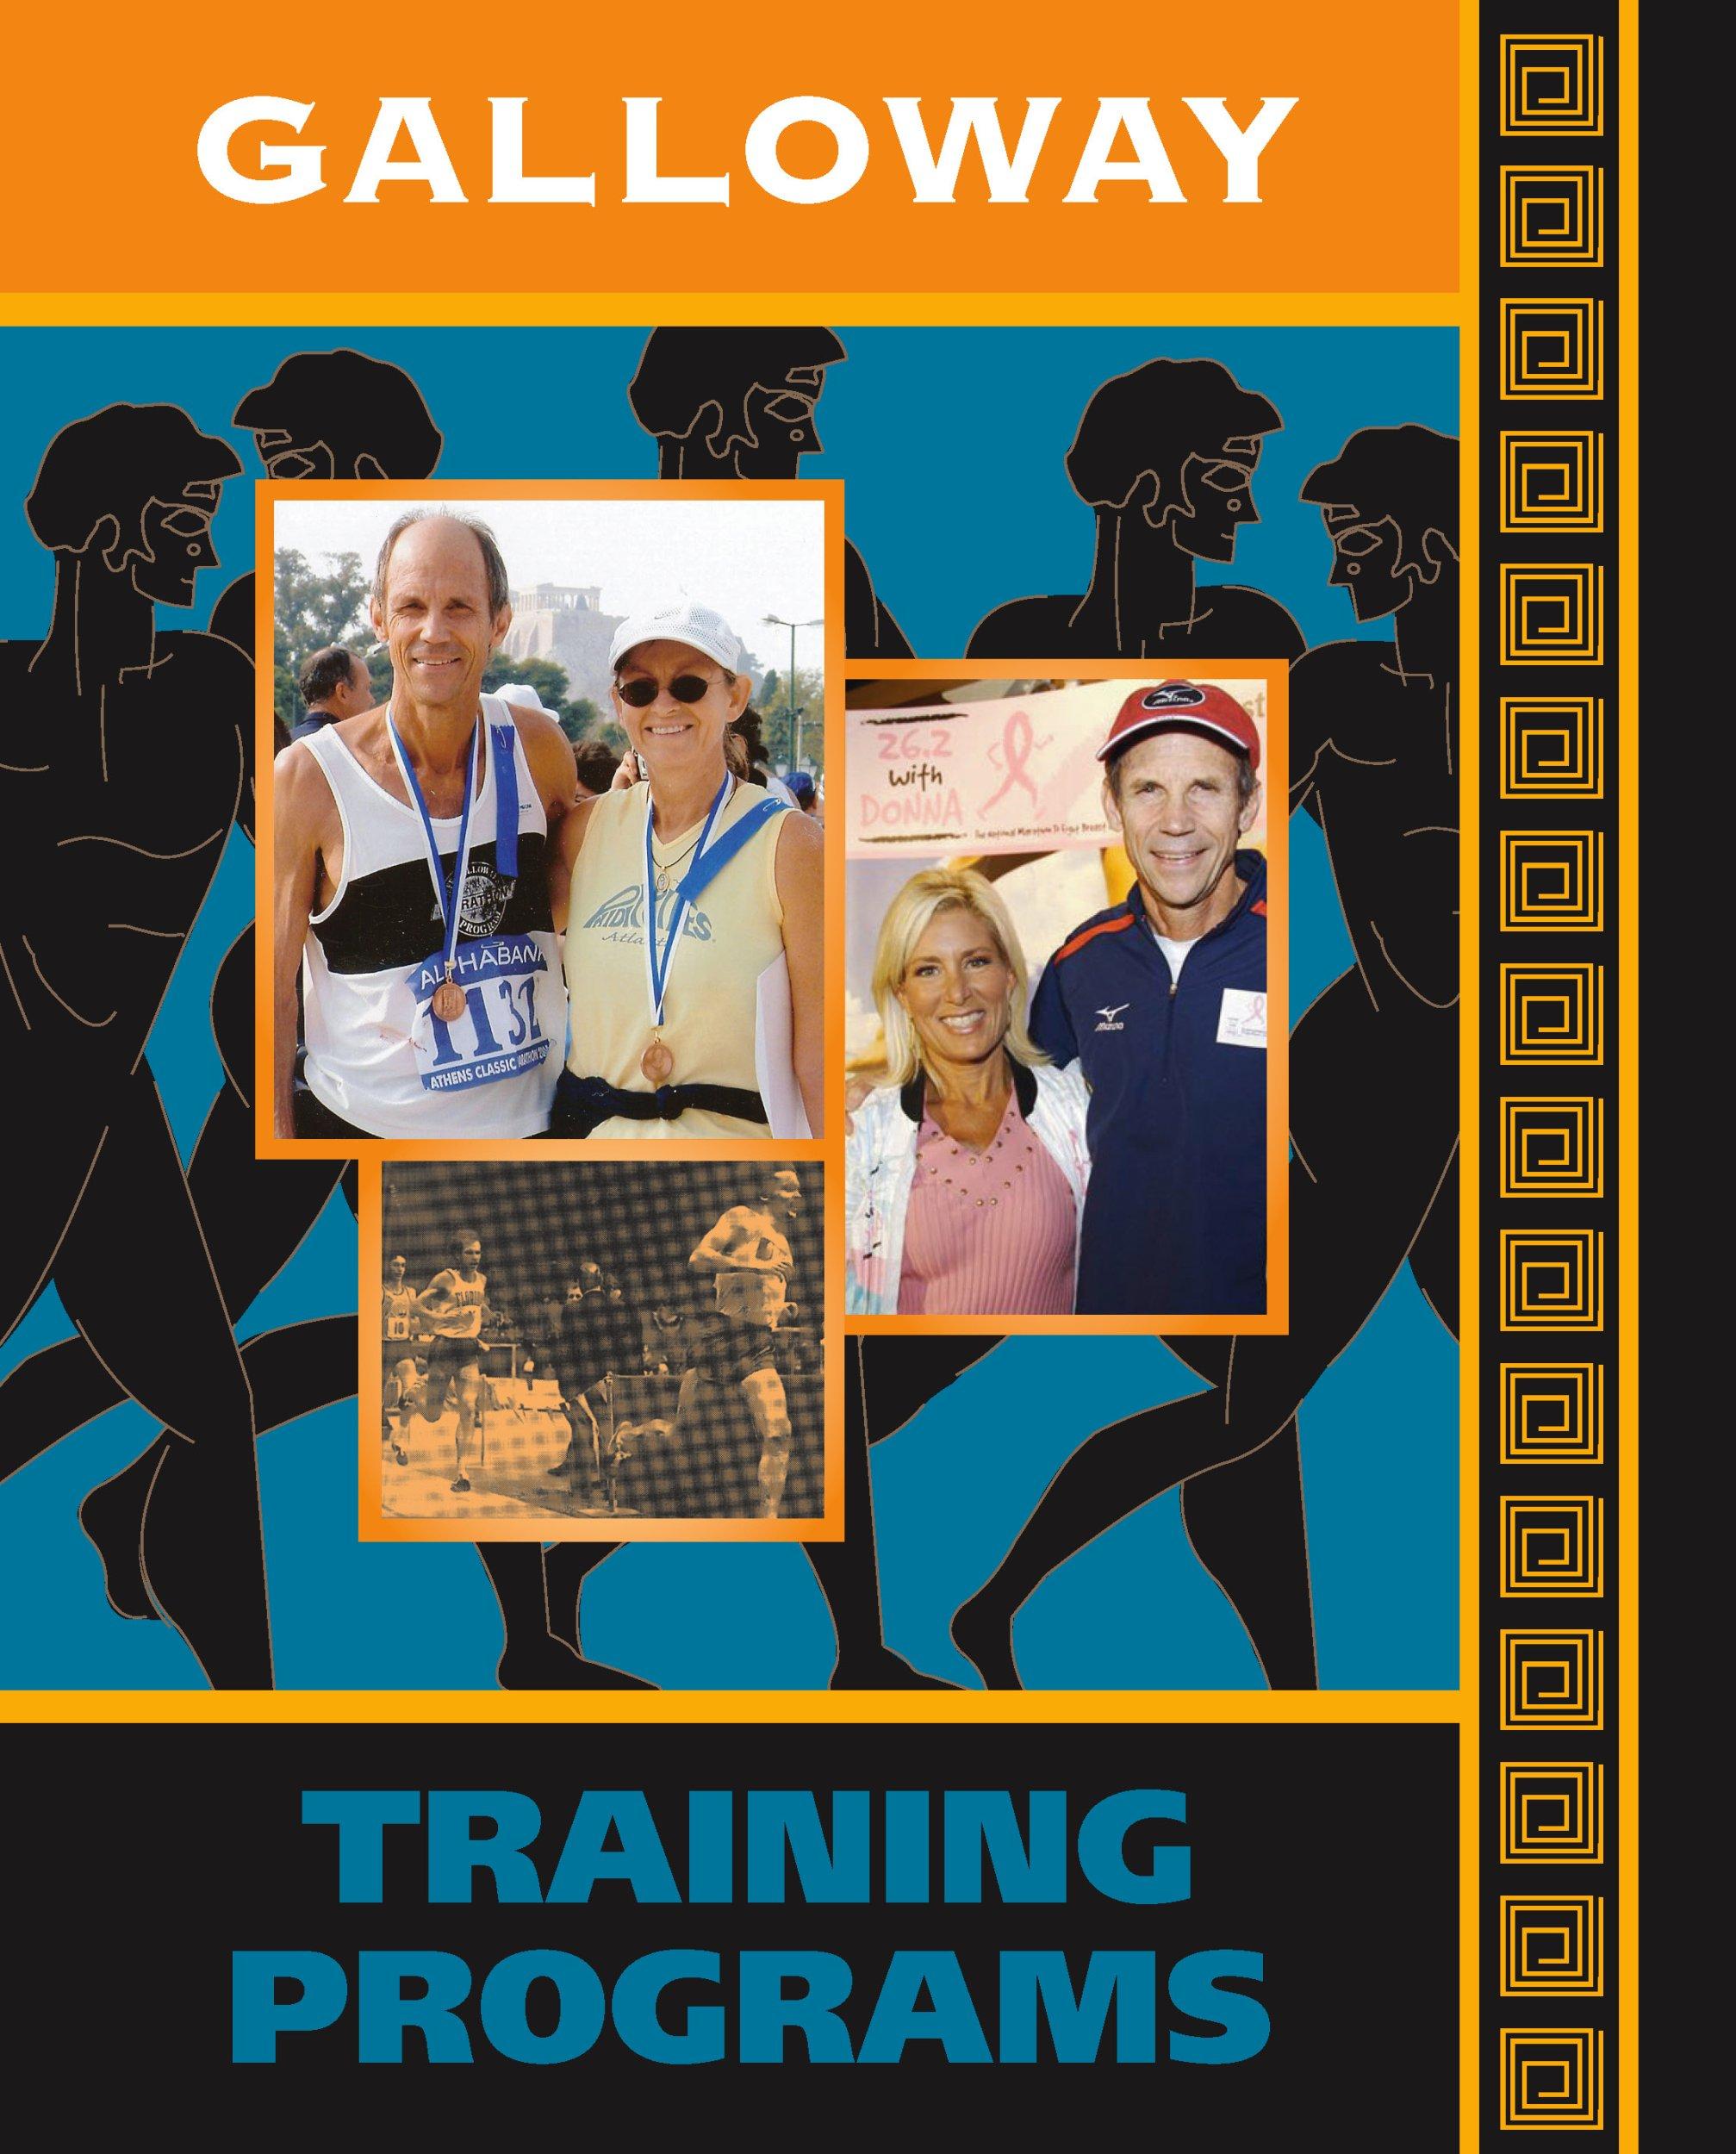 Galloway Training Programs: Jeff Galloway: 9780964718746: Amazon.com: Books